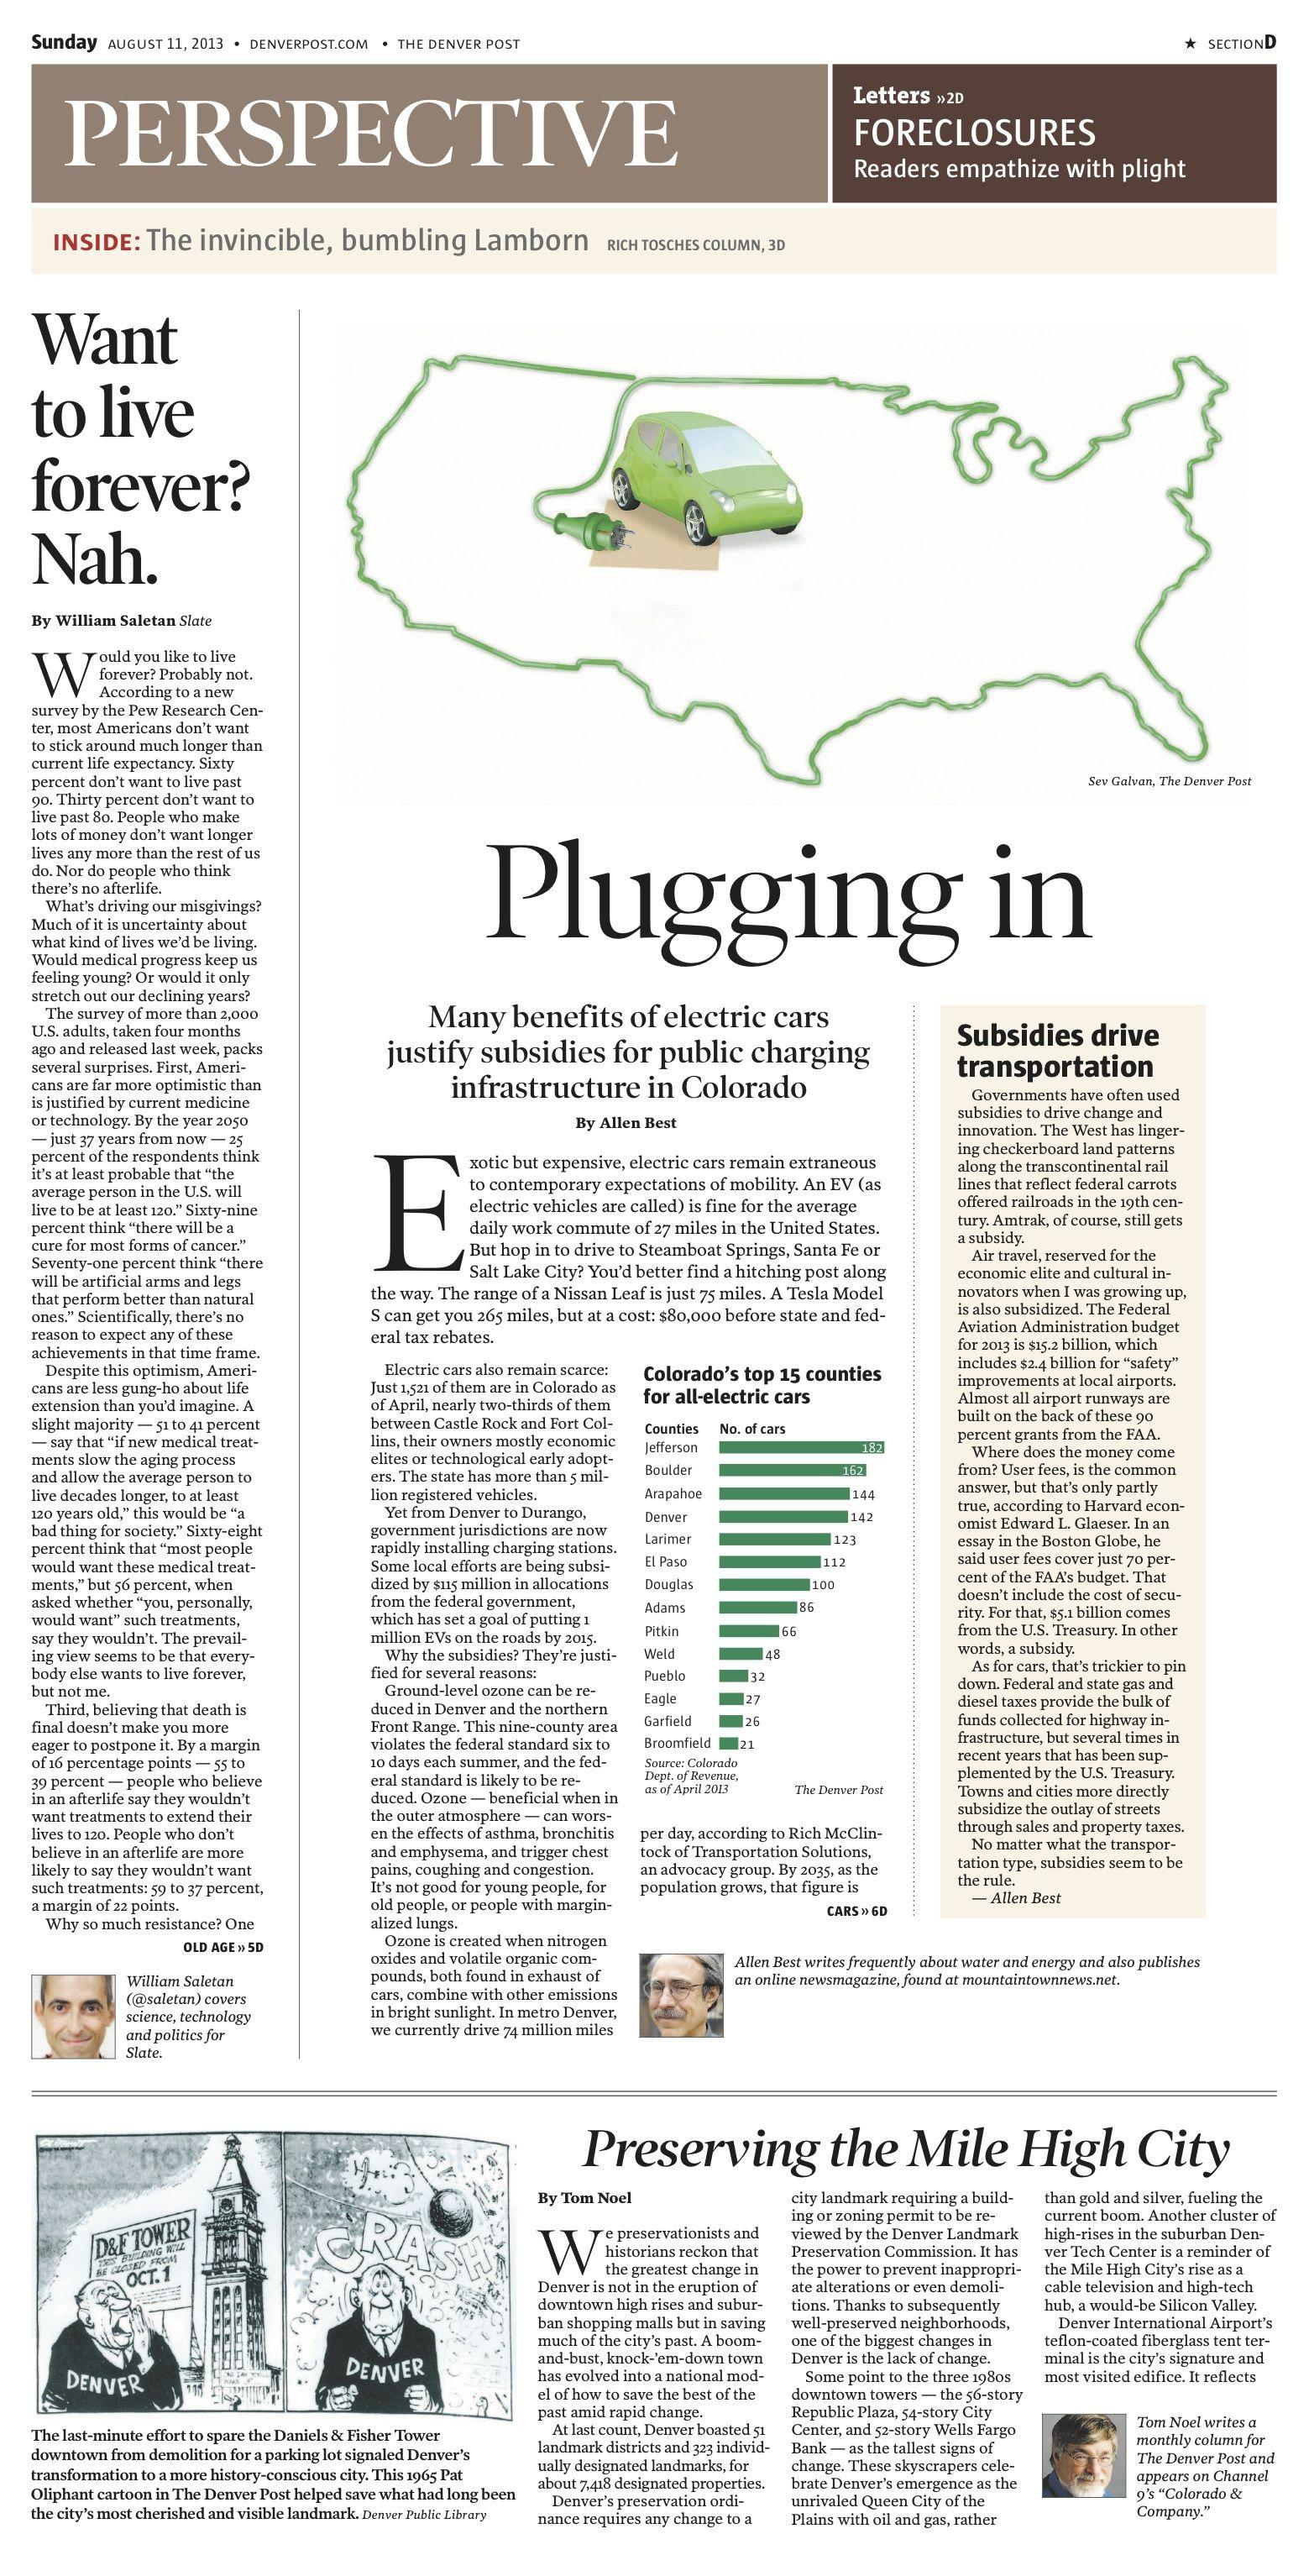 Sunday, August 11, 2013 Denver Post Perspective cover. Illustration by Sev Galvan.